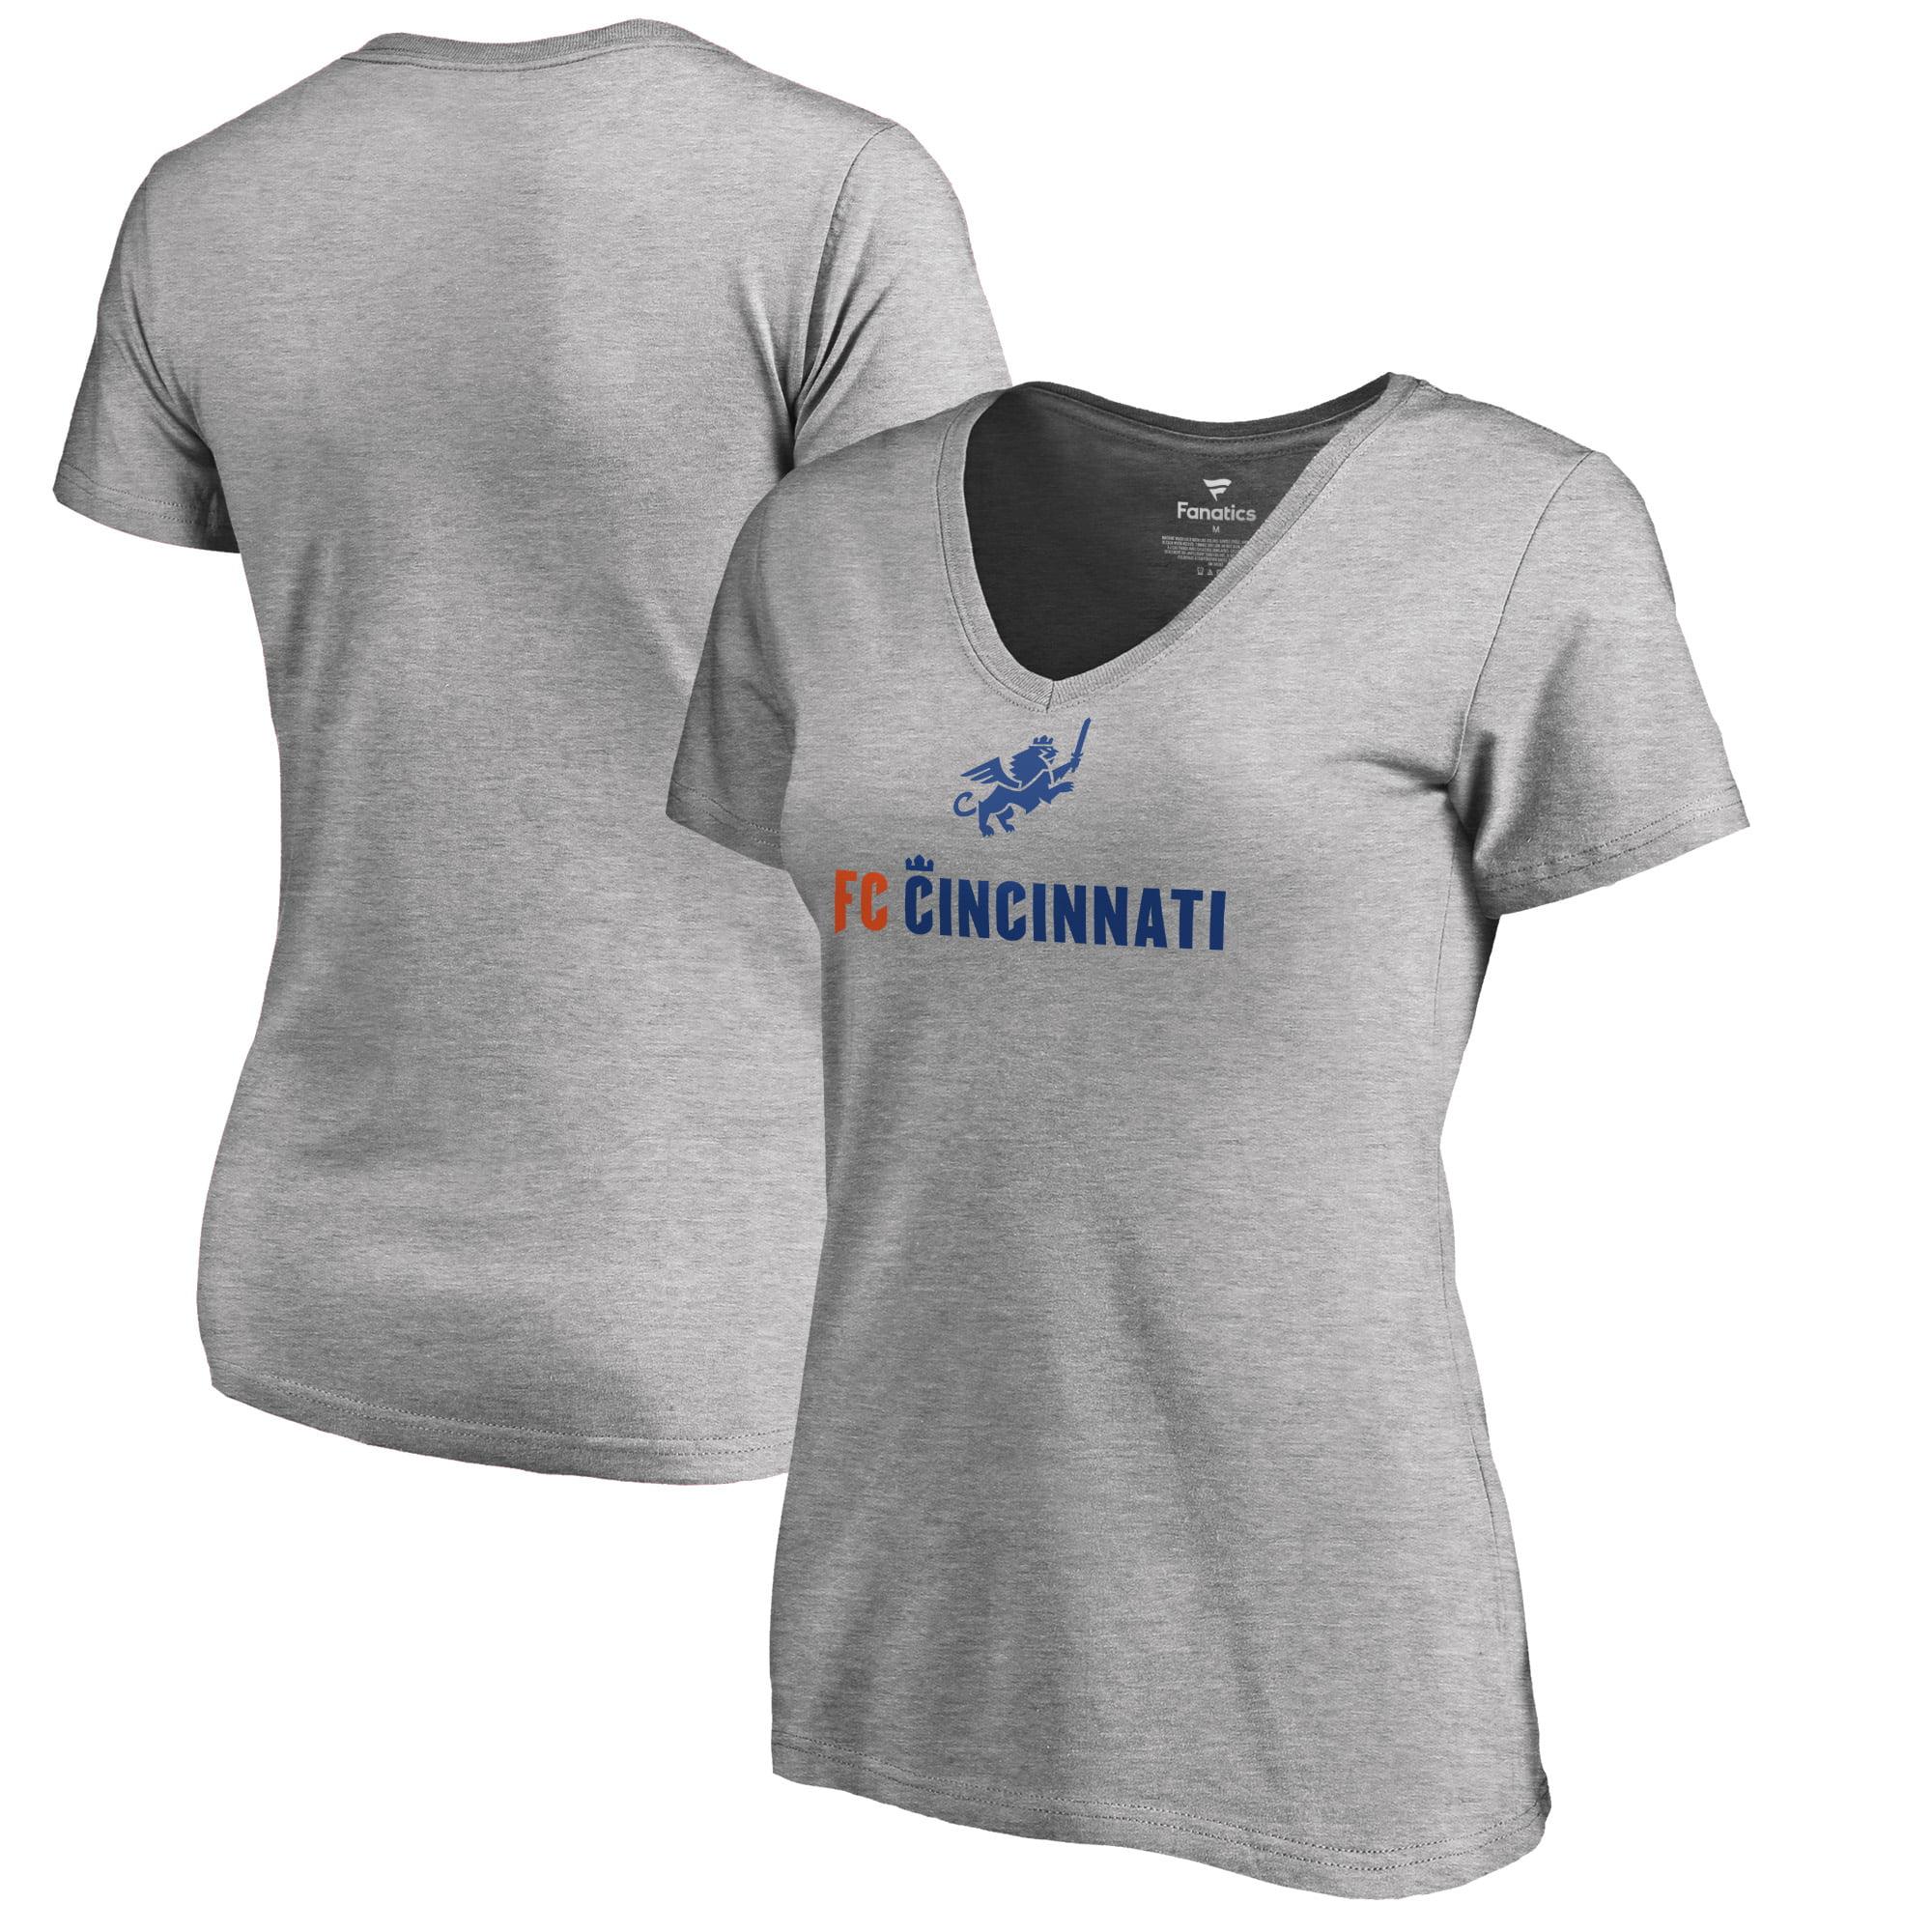 FC Cincinnati Fanatics Branded Women's Victory Arch Plus Size V-Neck T-Shirt - Heather Gray